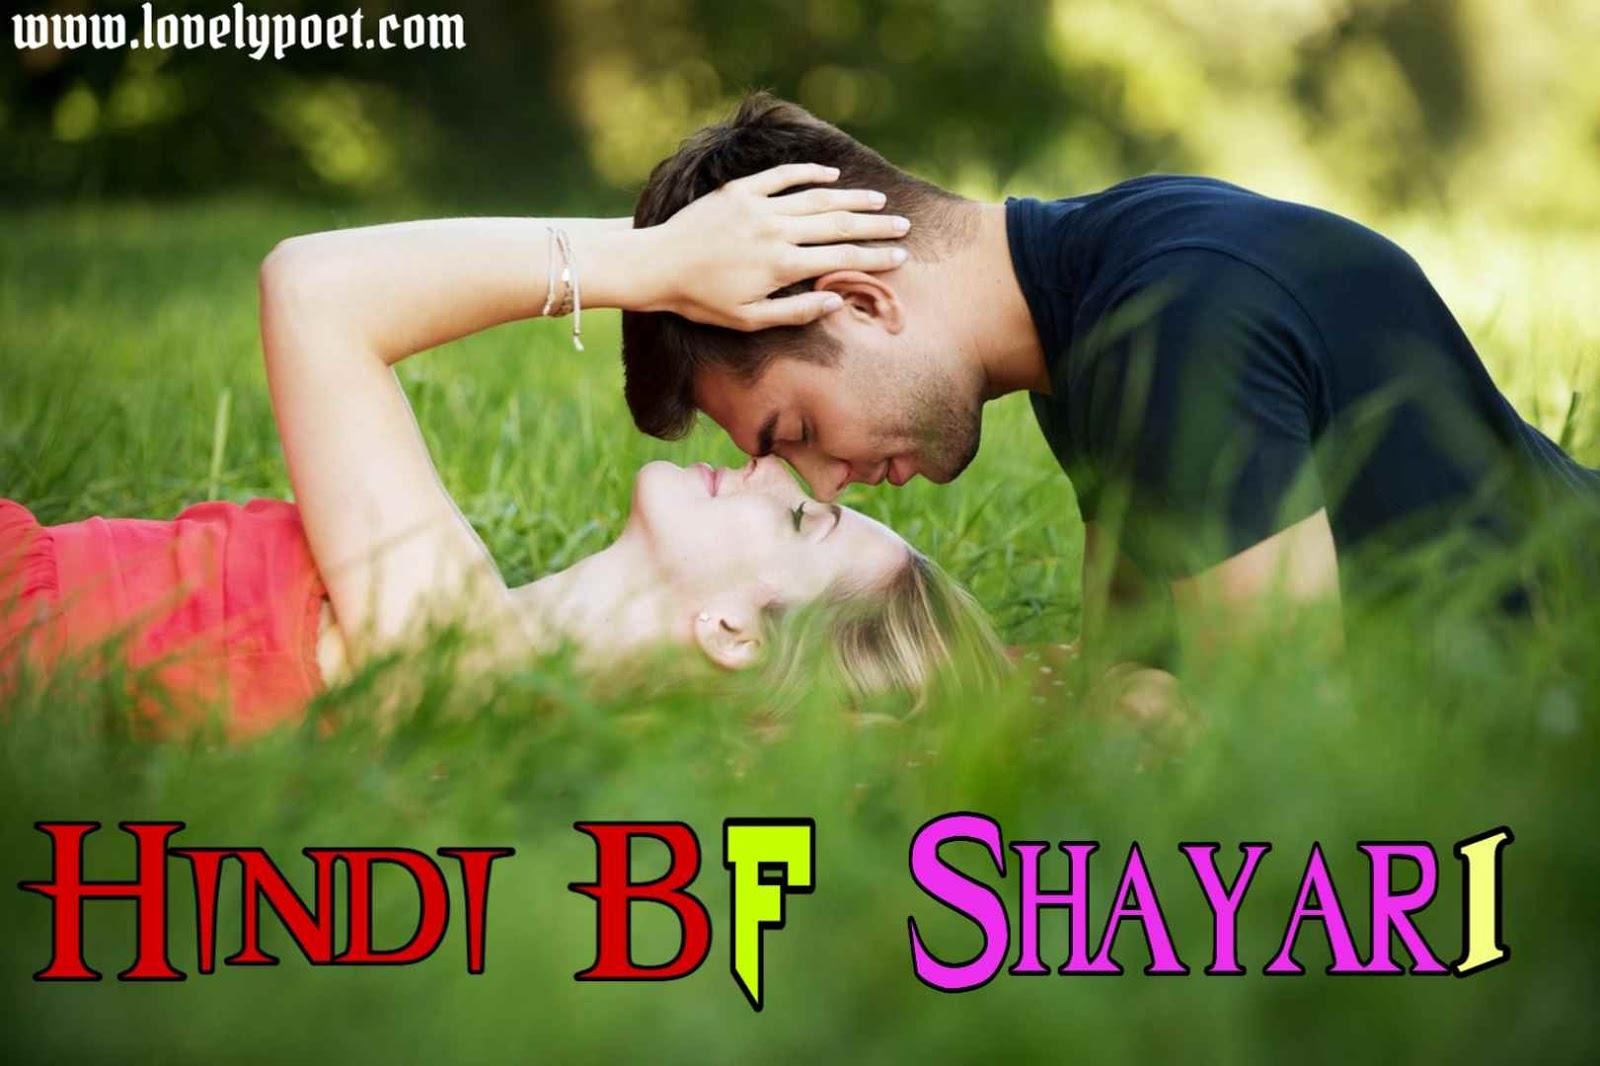 hindi-bf-shayari